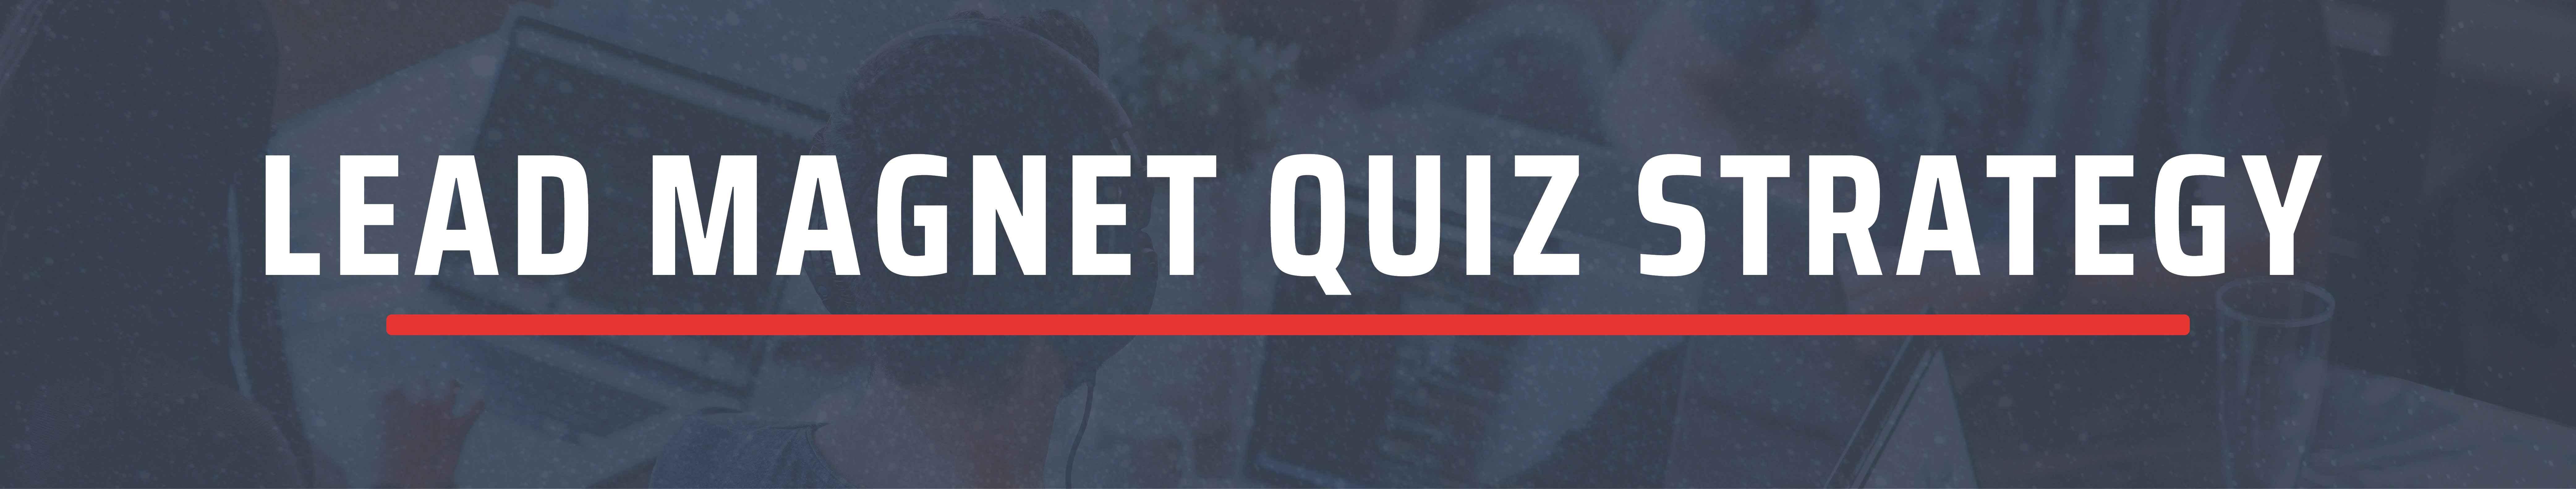 Lead Magnet Quiz Strategy-Square-R3.jpg